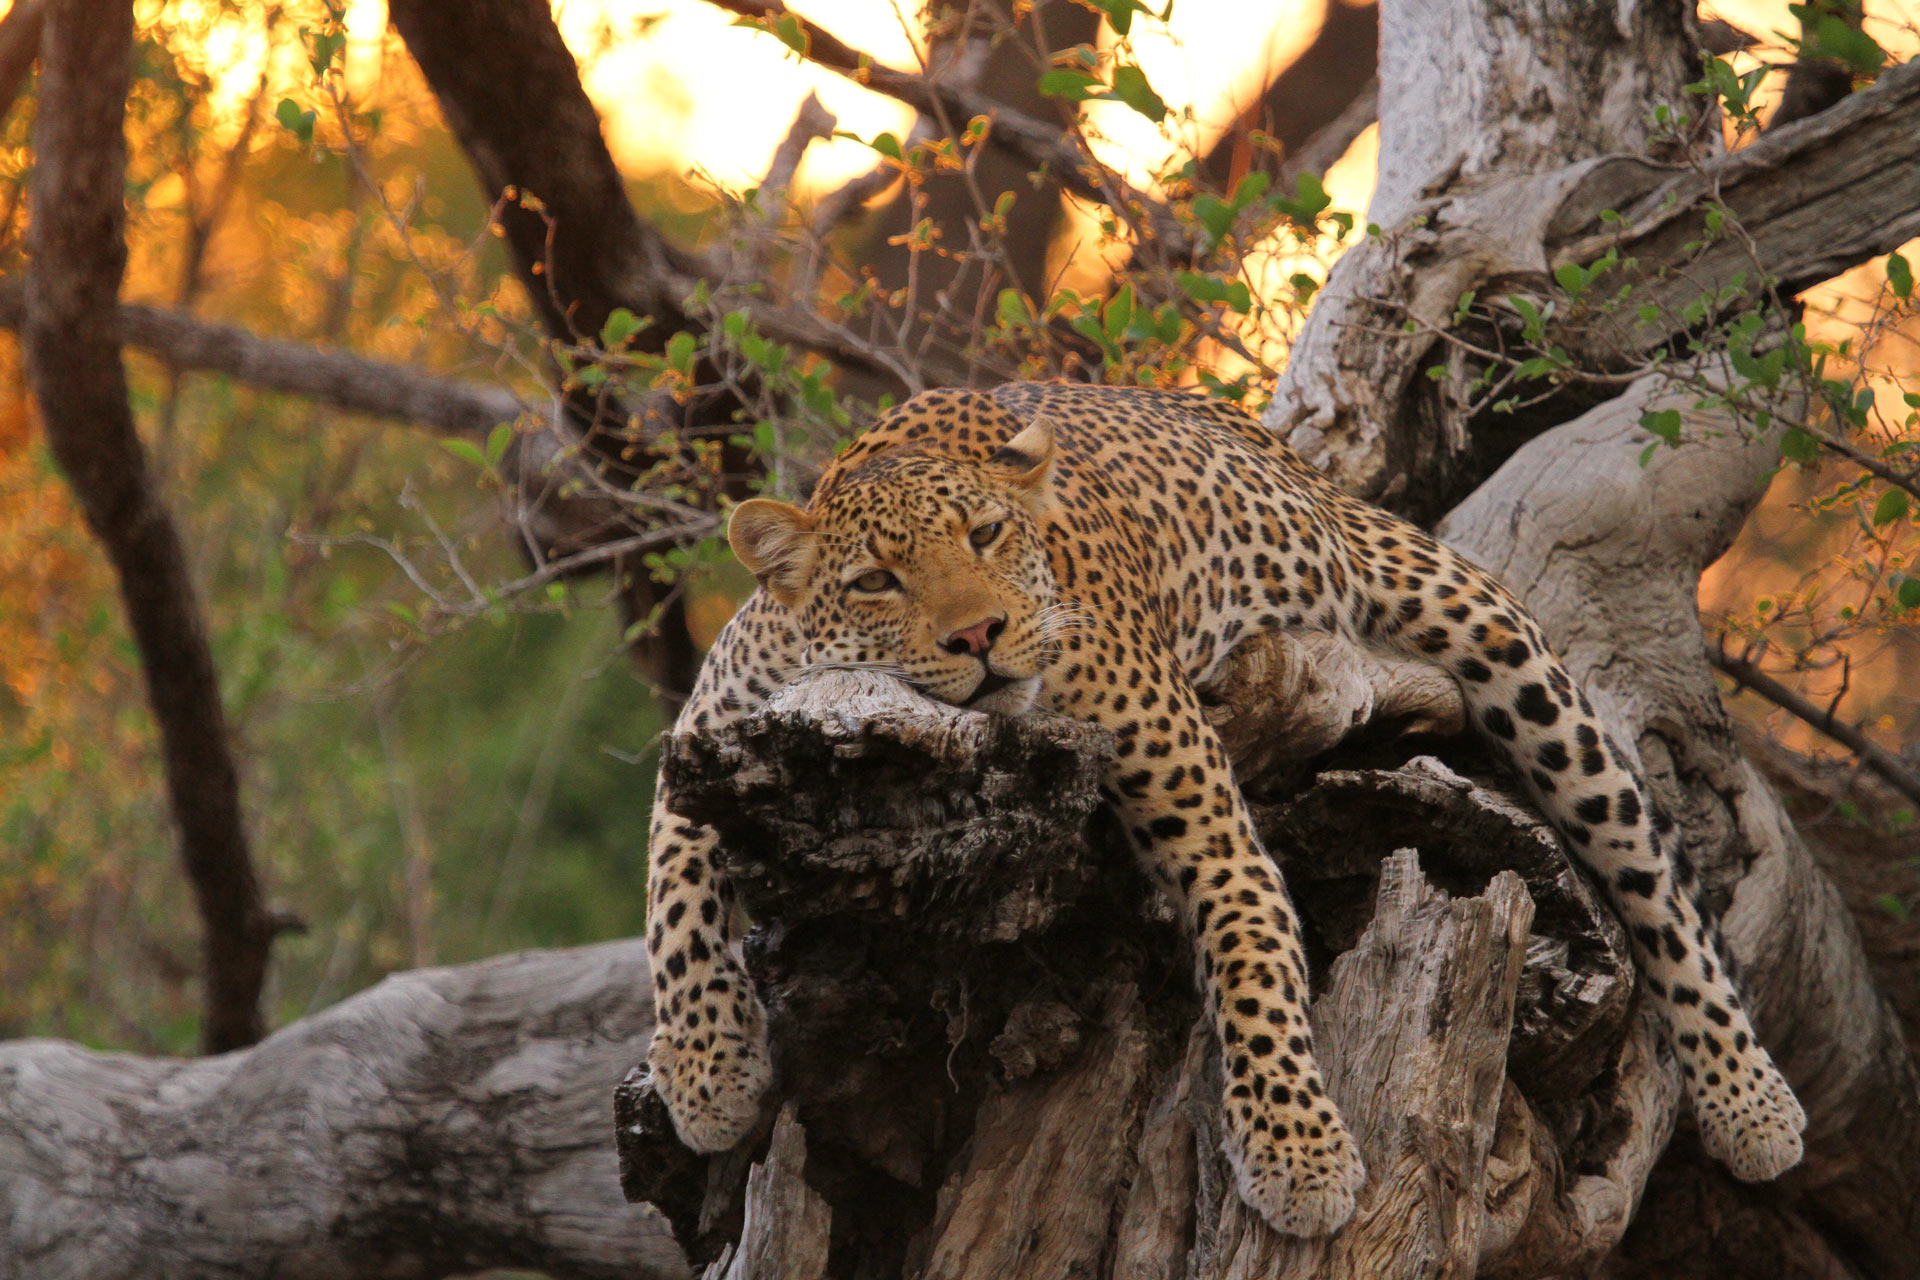 Lazy Leoperd lying on a tree branch in the Luangwa Valley, Zambia